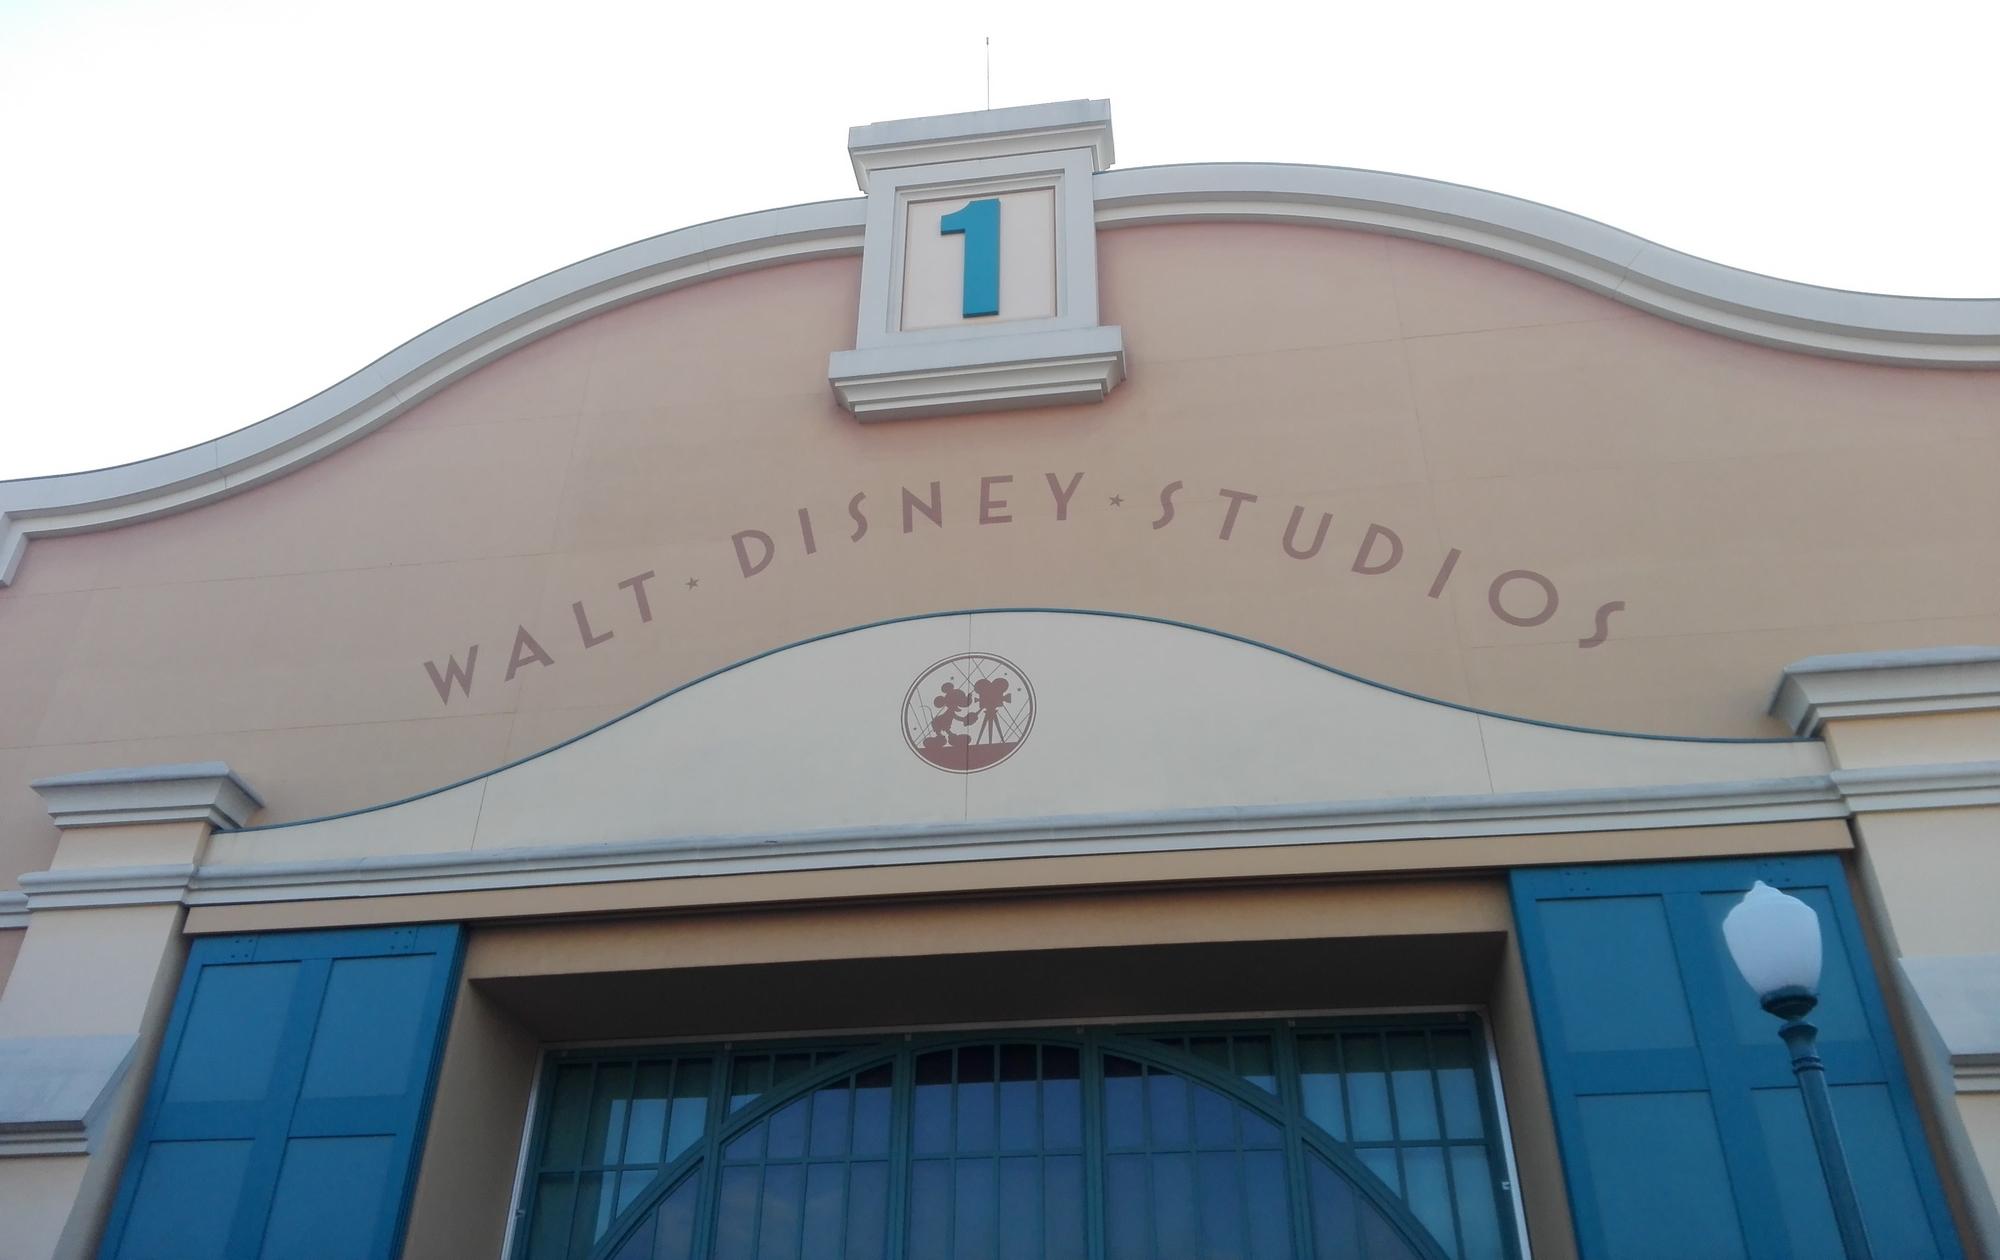 Walt Disney Studios - Studio 1